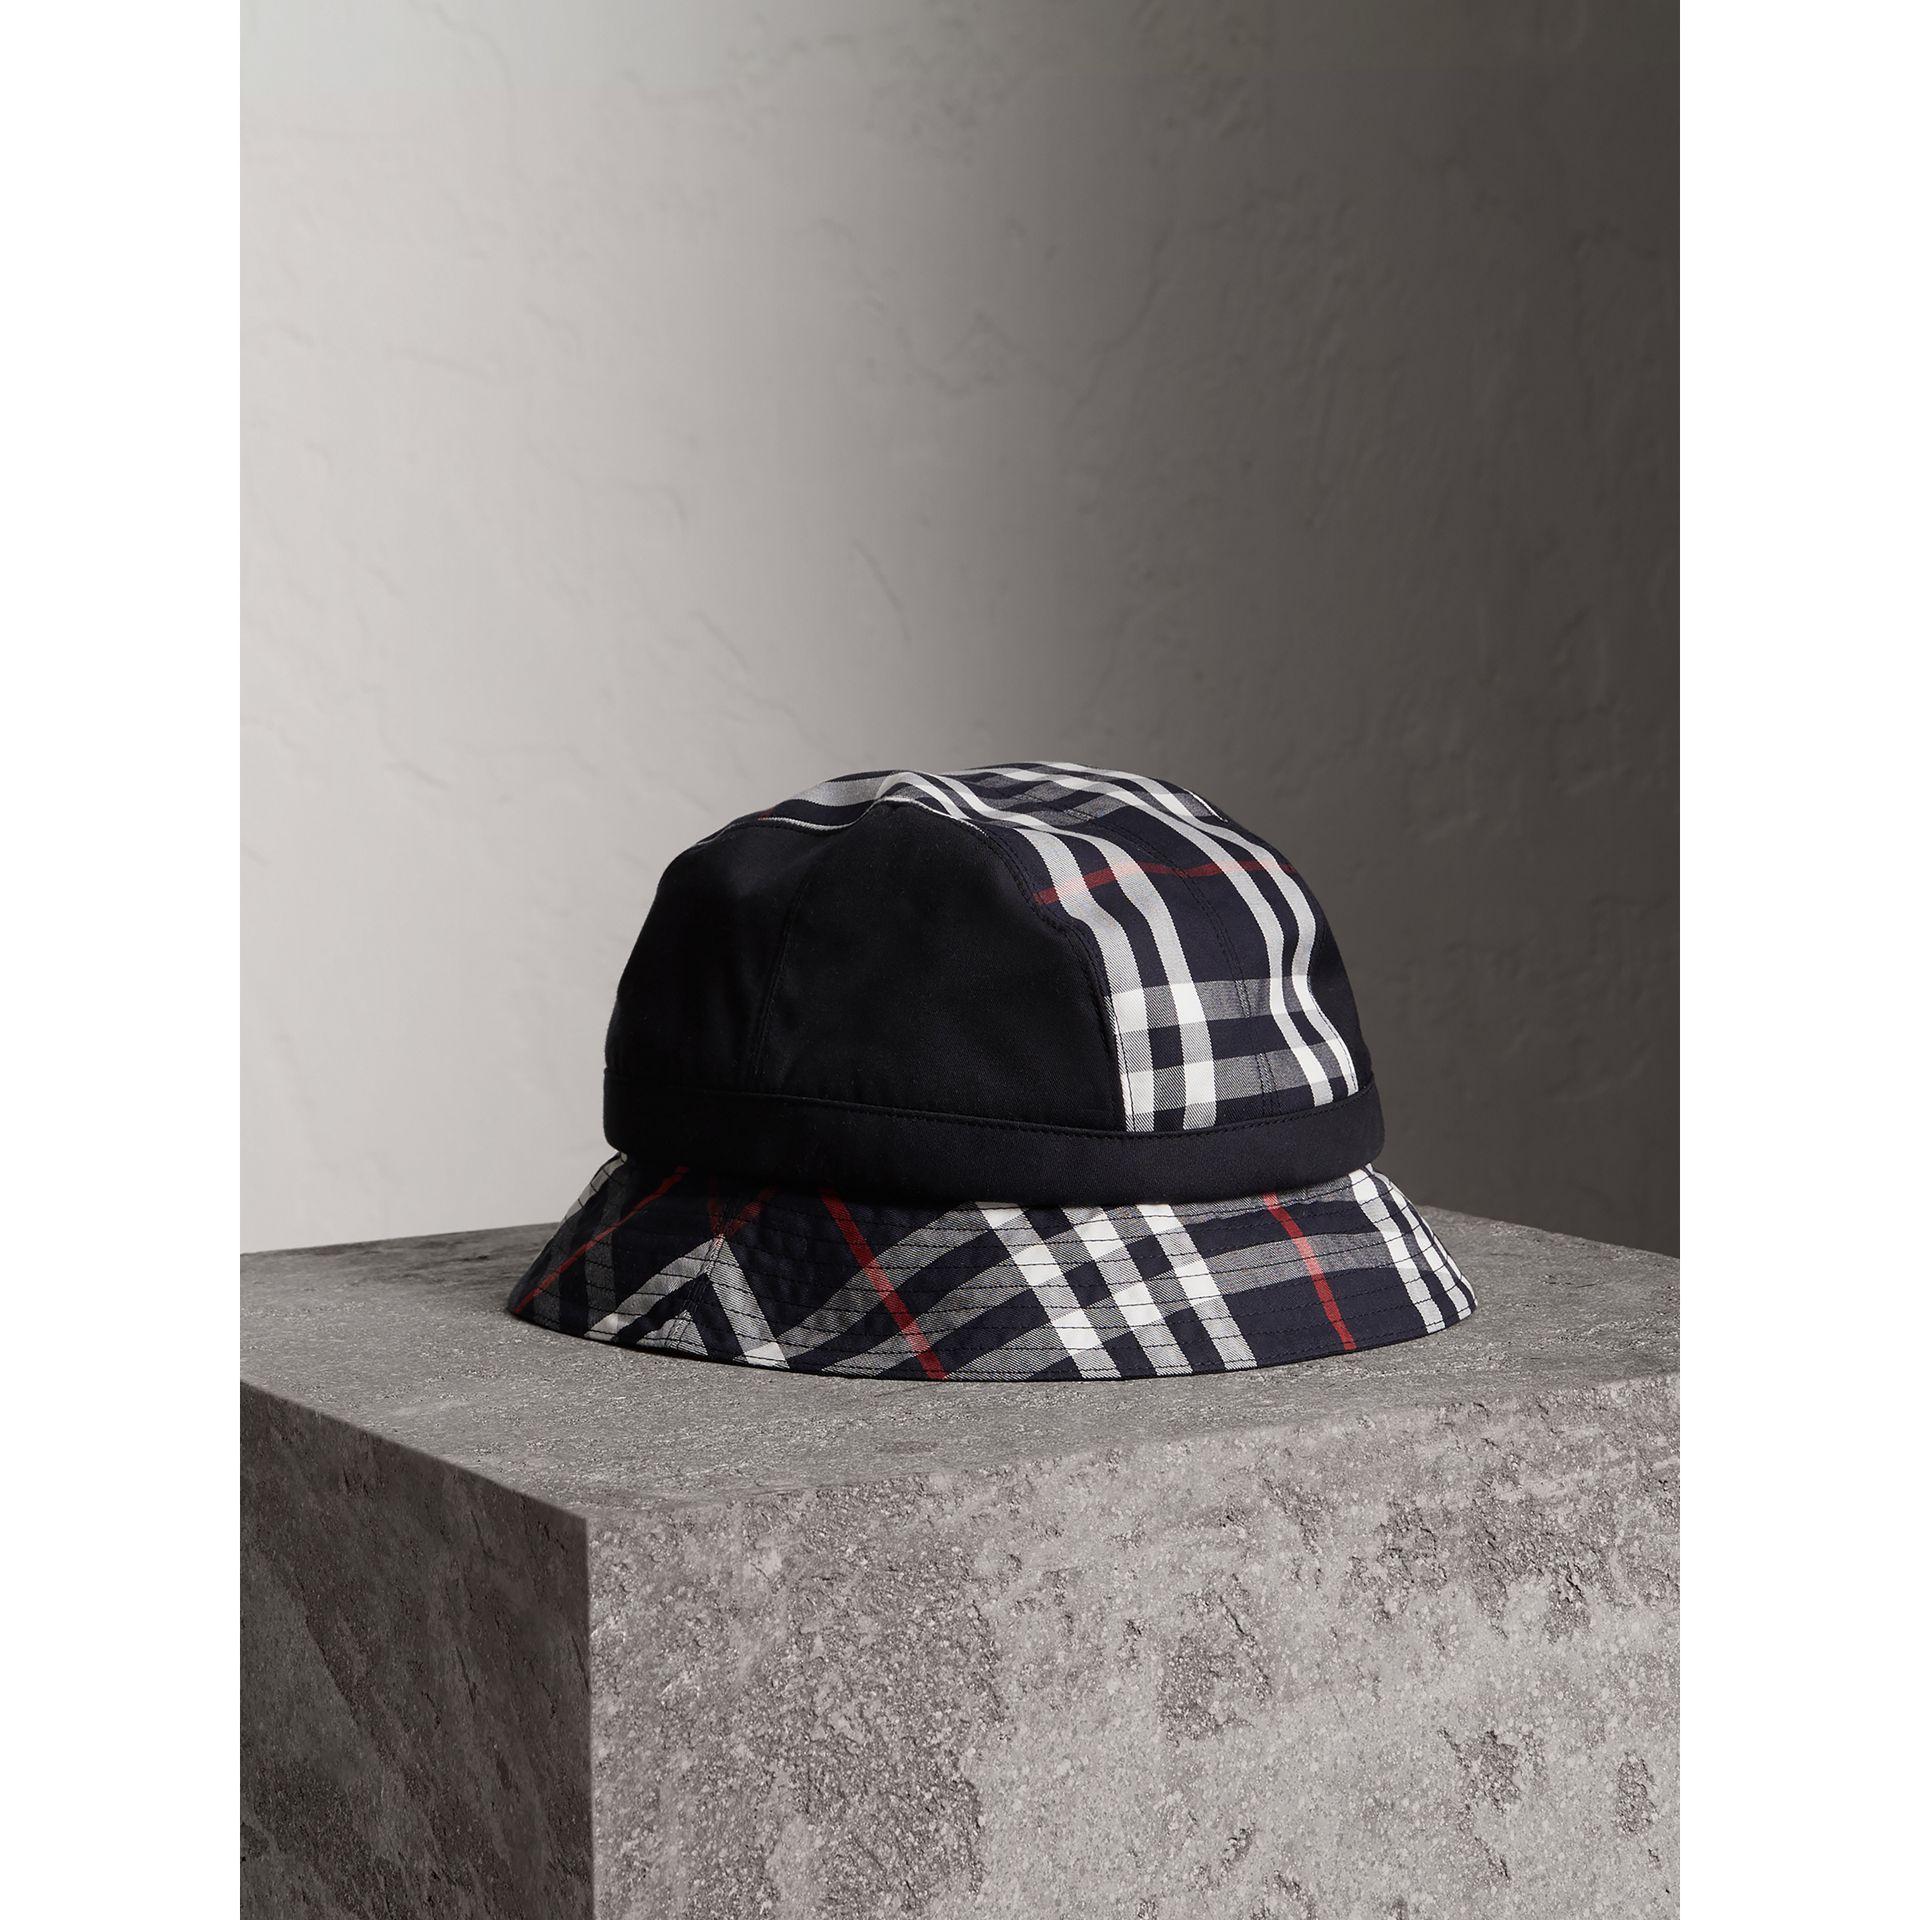 Burberry Gosha X Bucket Hat In Navy  73a7965e6cd